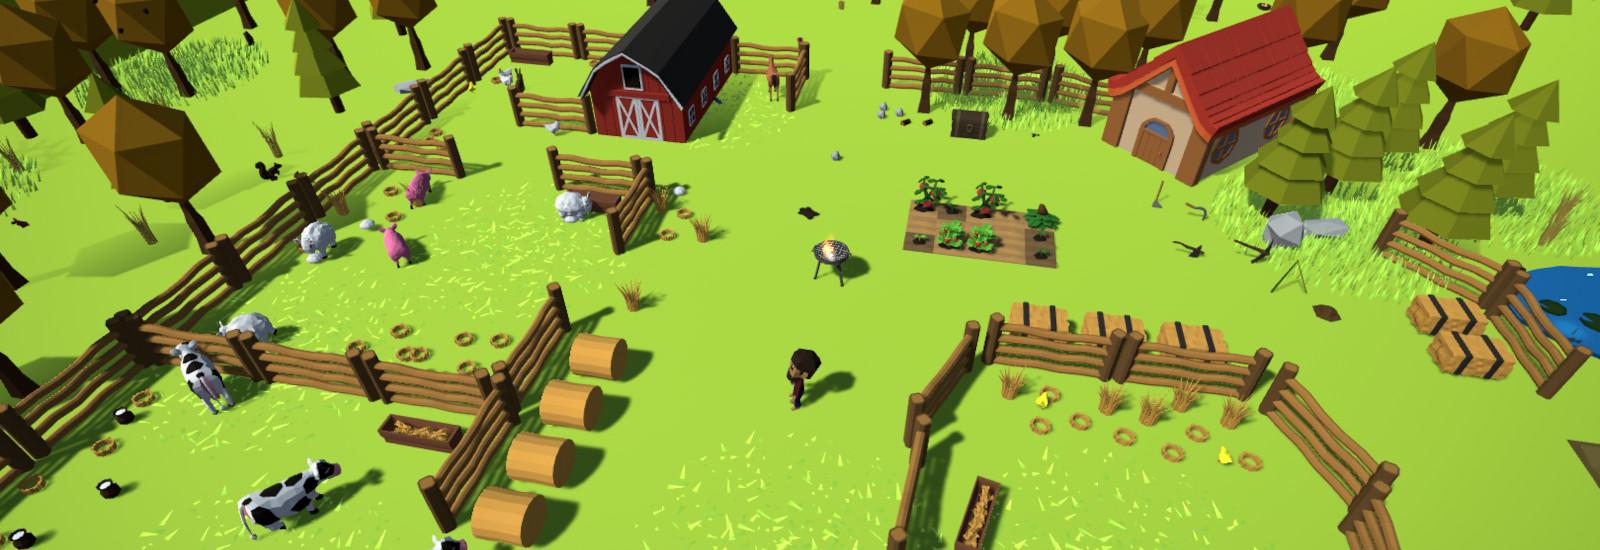 Farming Engine - Unity Asset